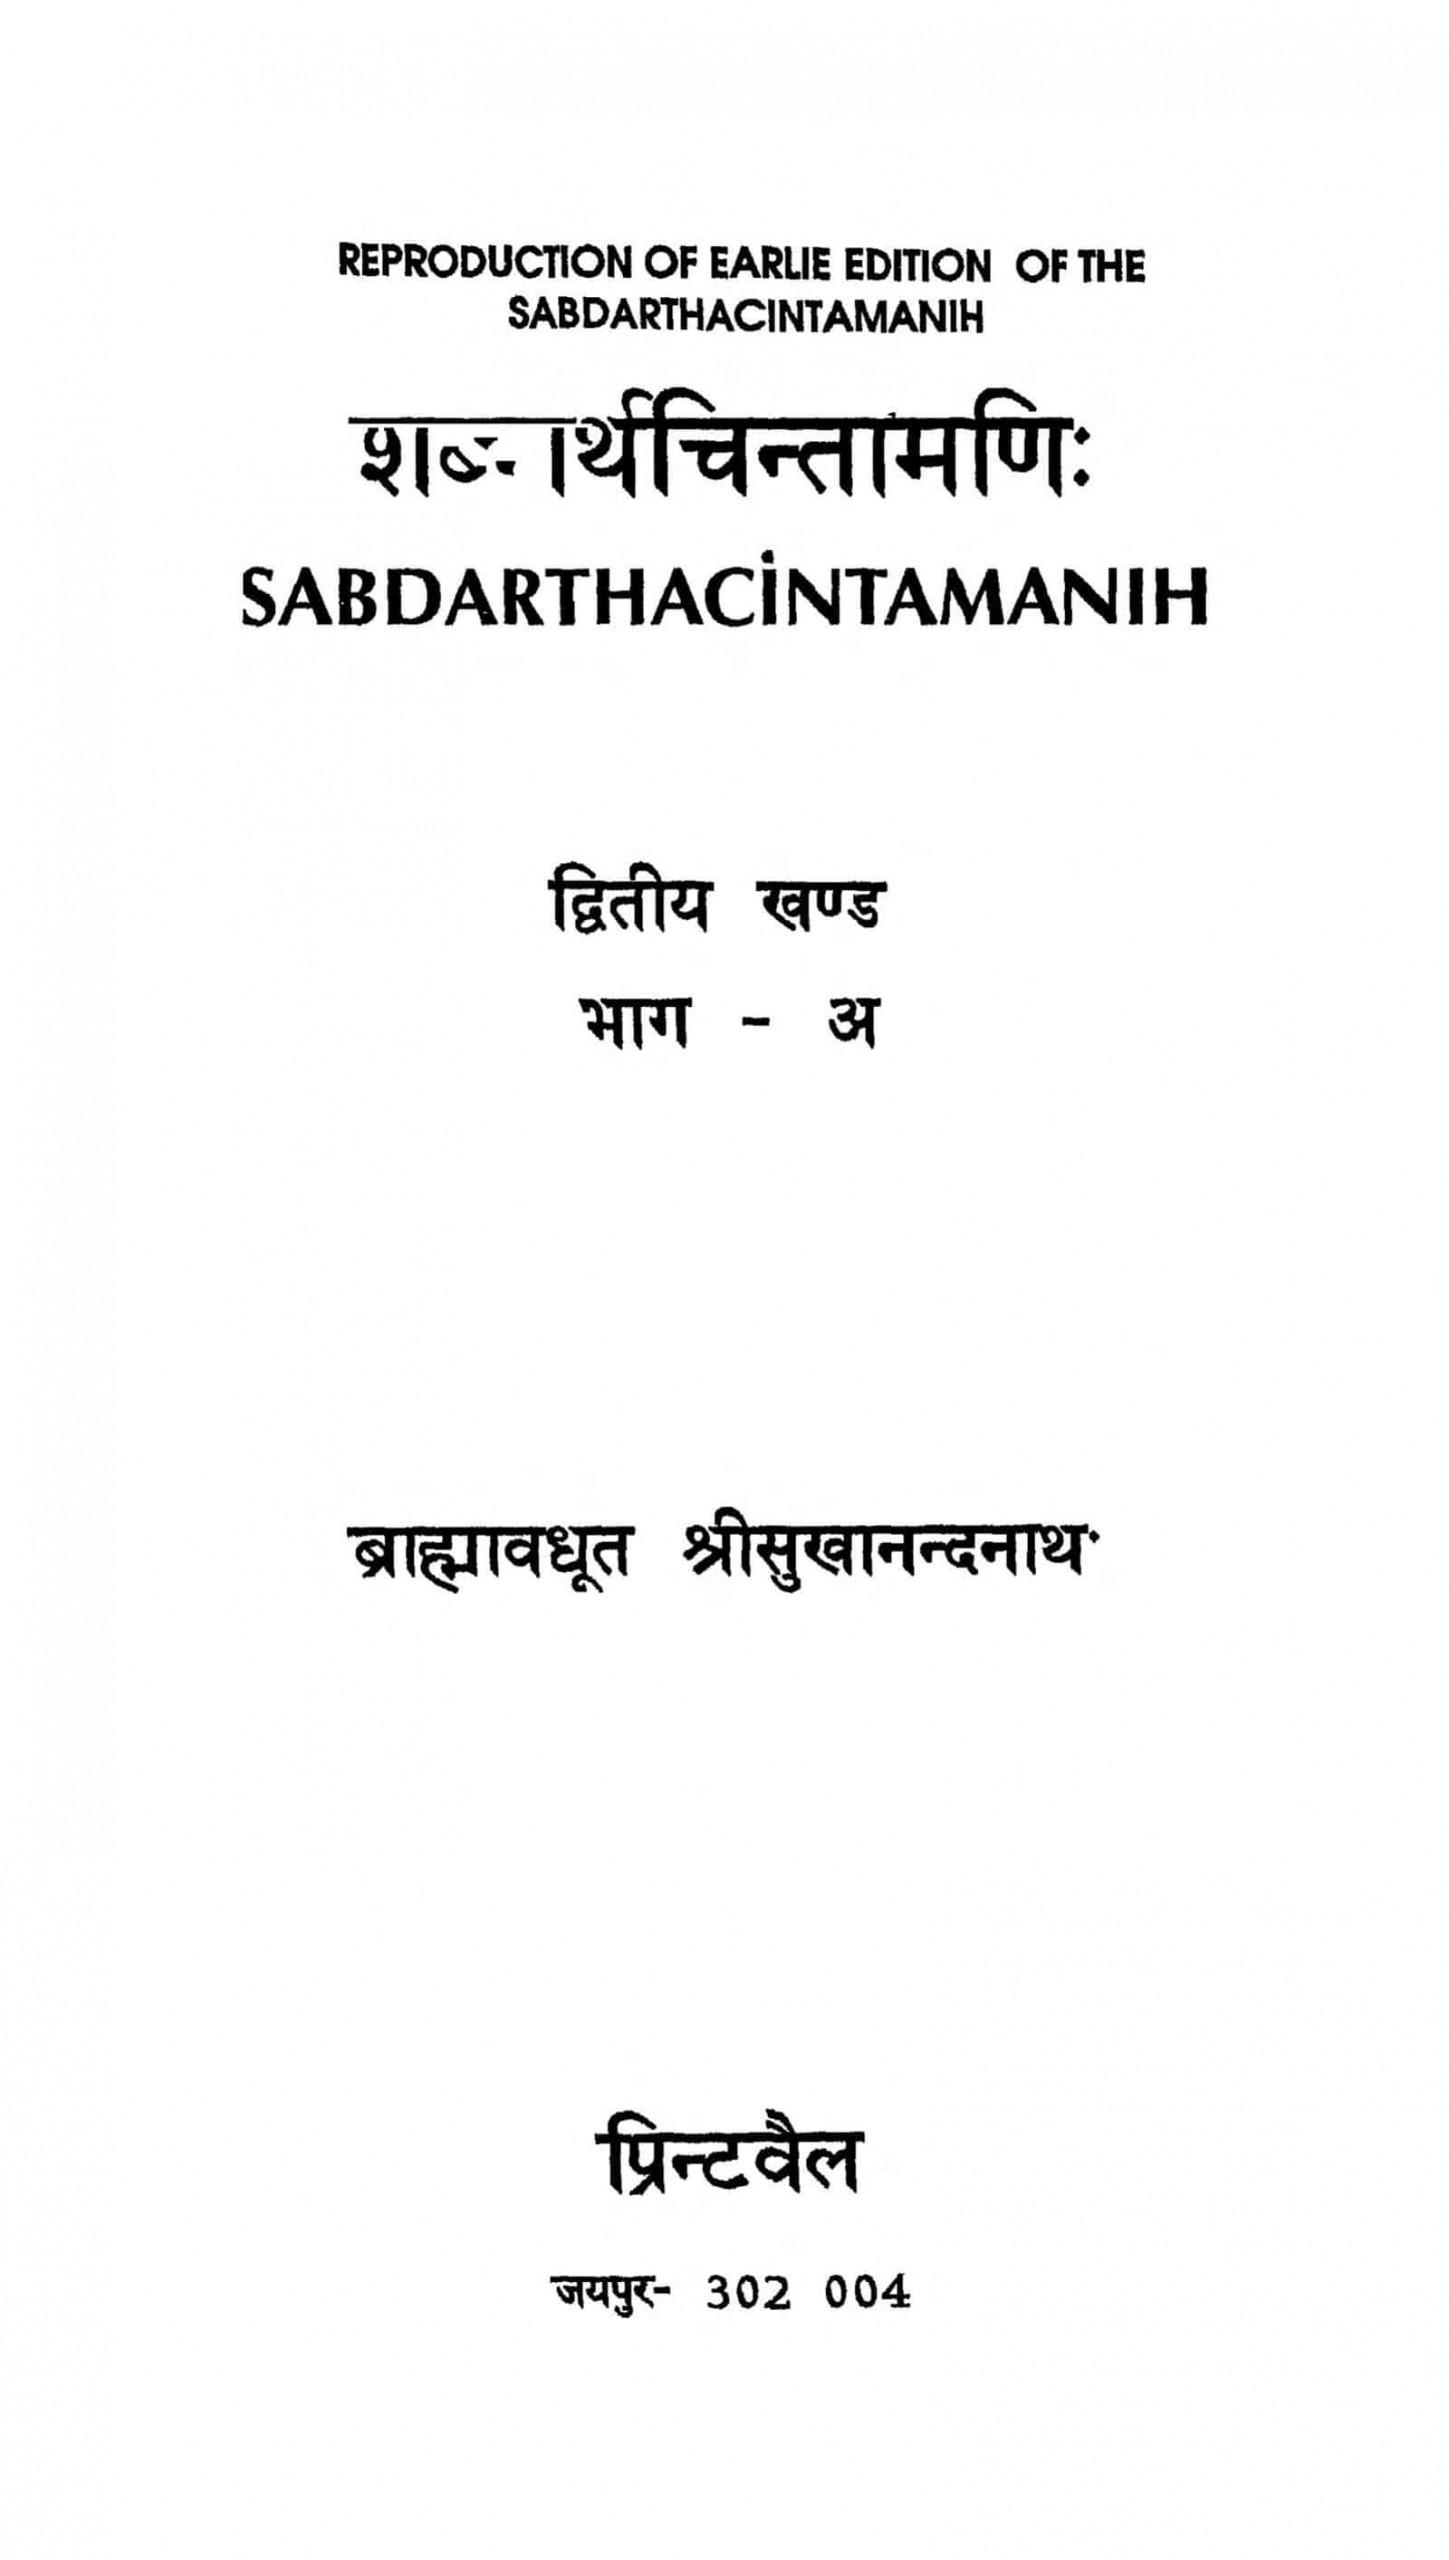 Book Image : शब्दार्थचिन्तामणि: द्वितीय खण्ड - Shabdarthchintamani Bhag 2